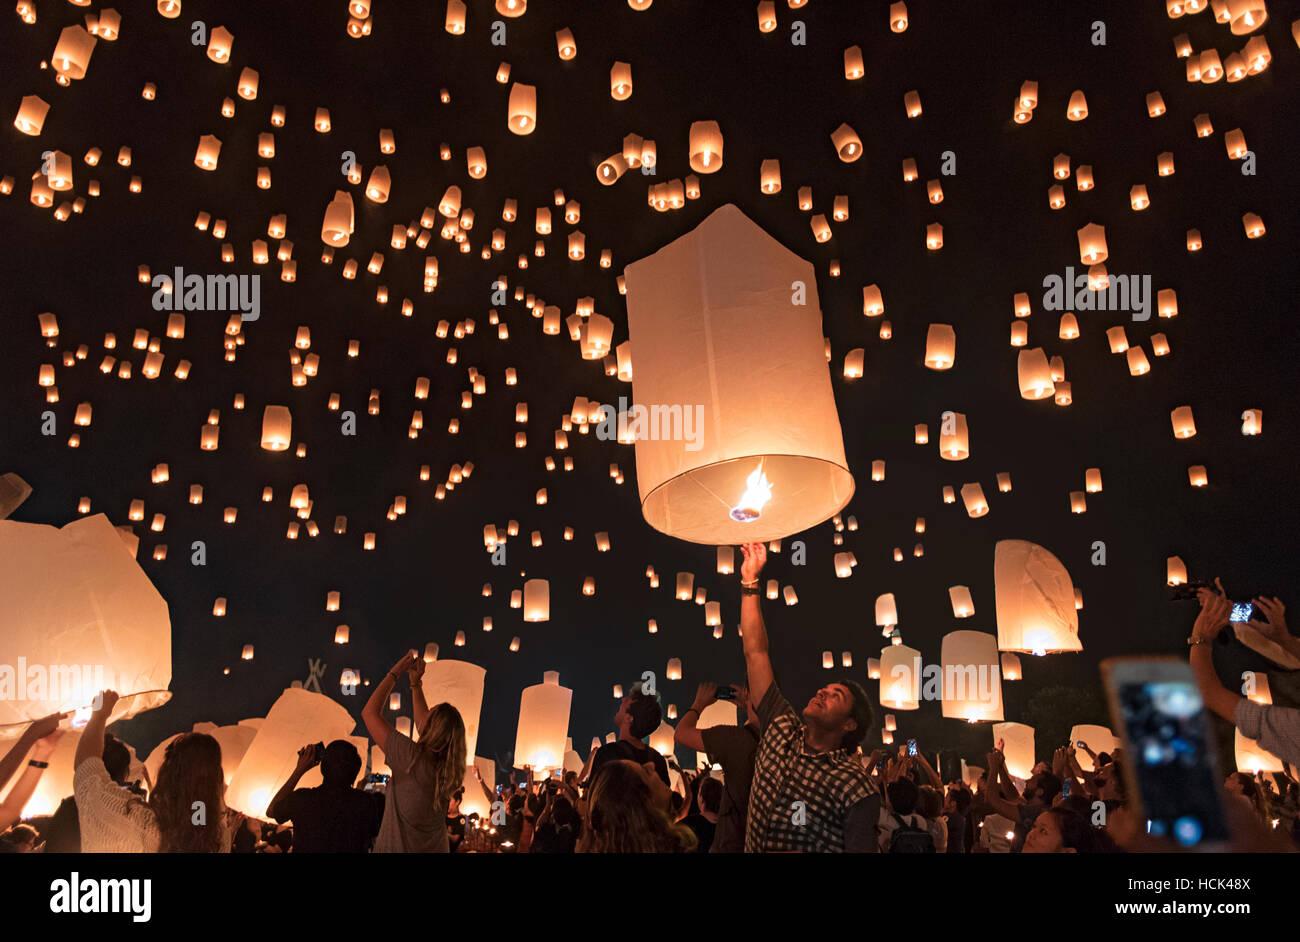 Yi Peng festa delle lanterne; Chiang Mai, Thailandia Immagini Stock